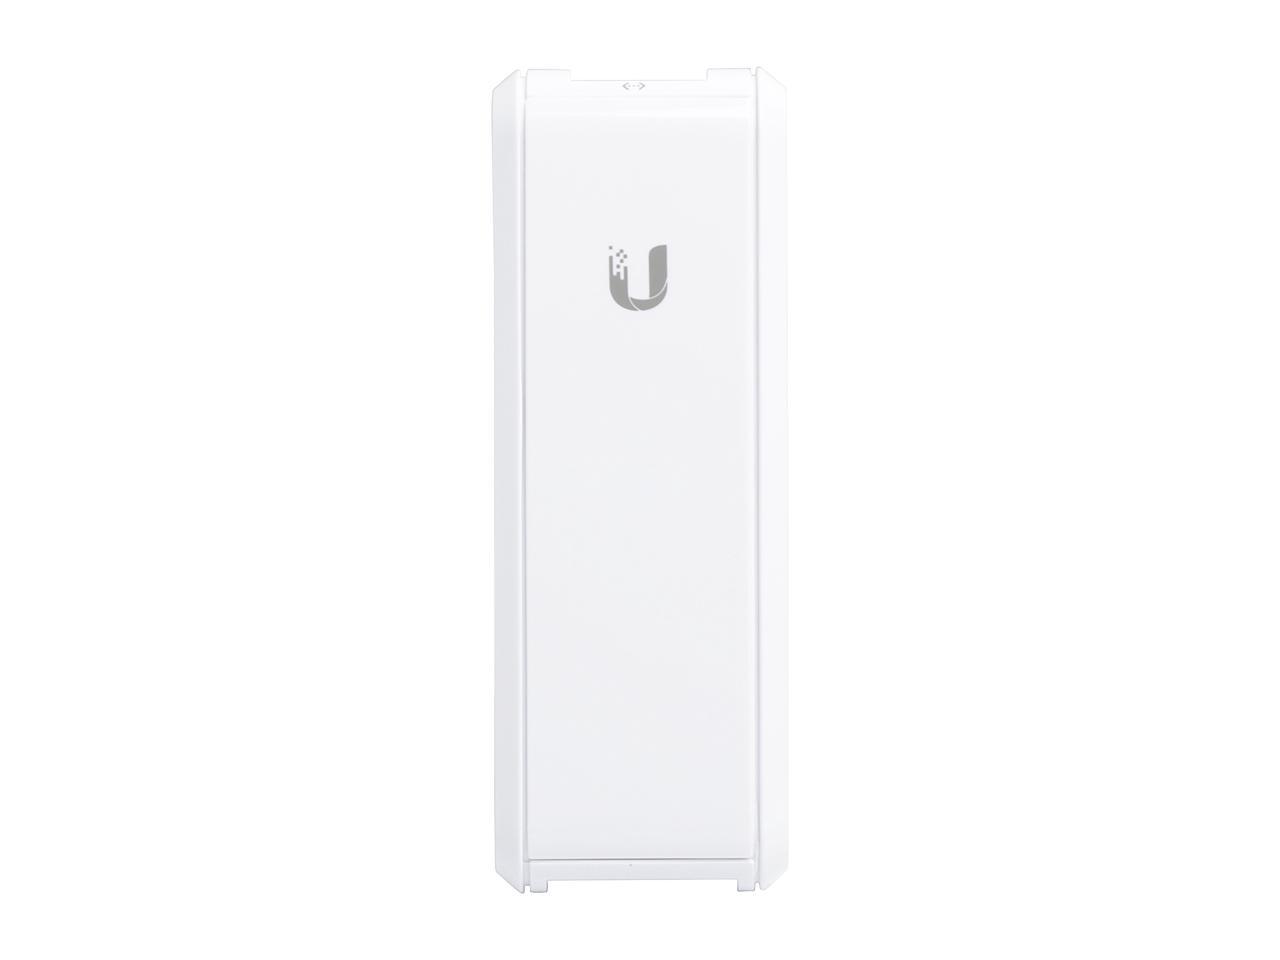 Ubiquiti: Long Range Access Point $80, Unifi Controller